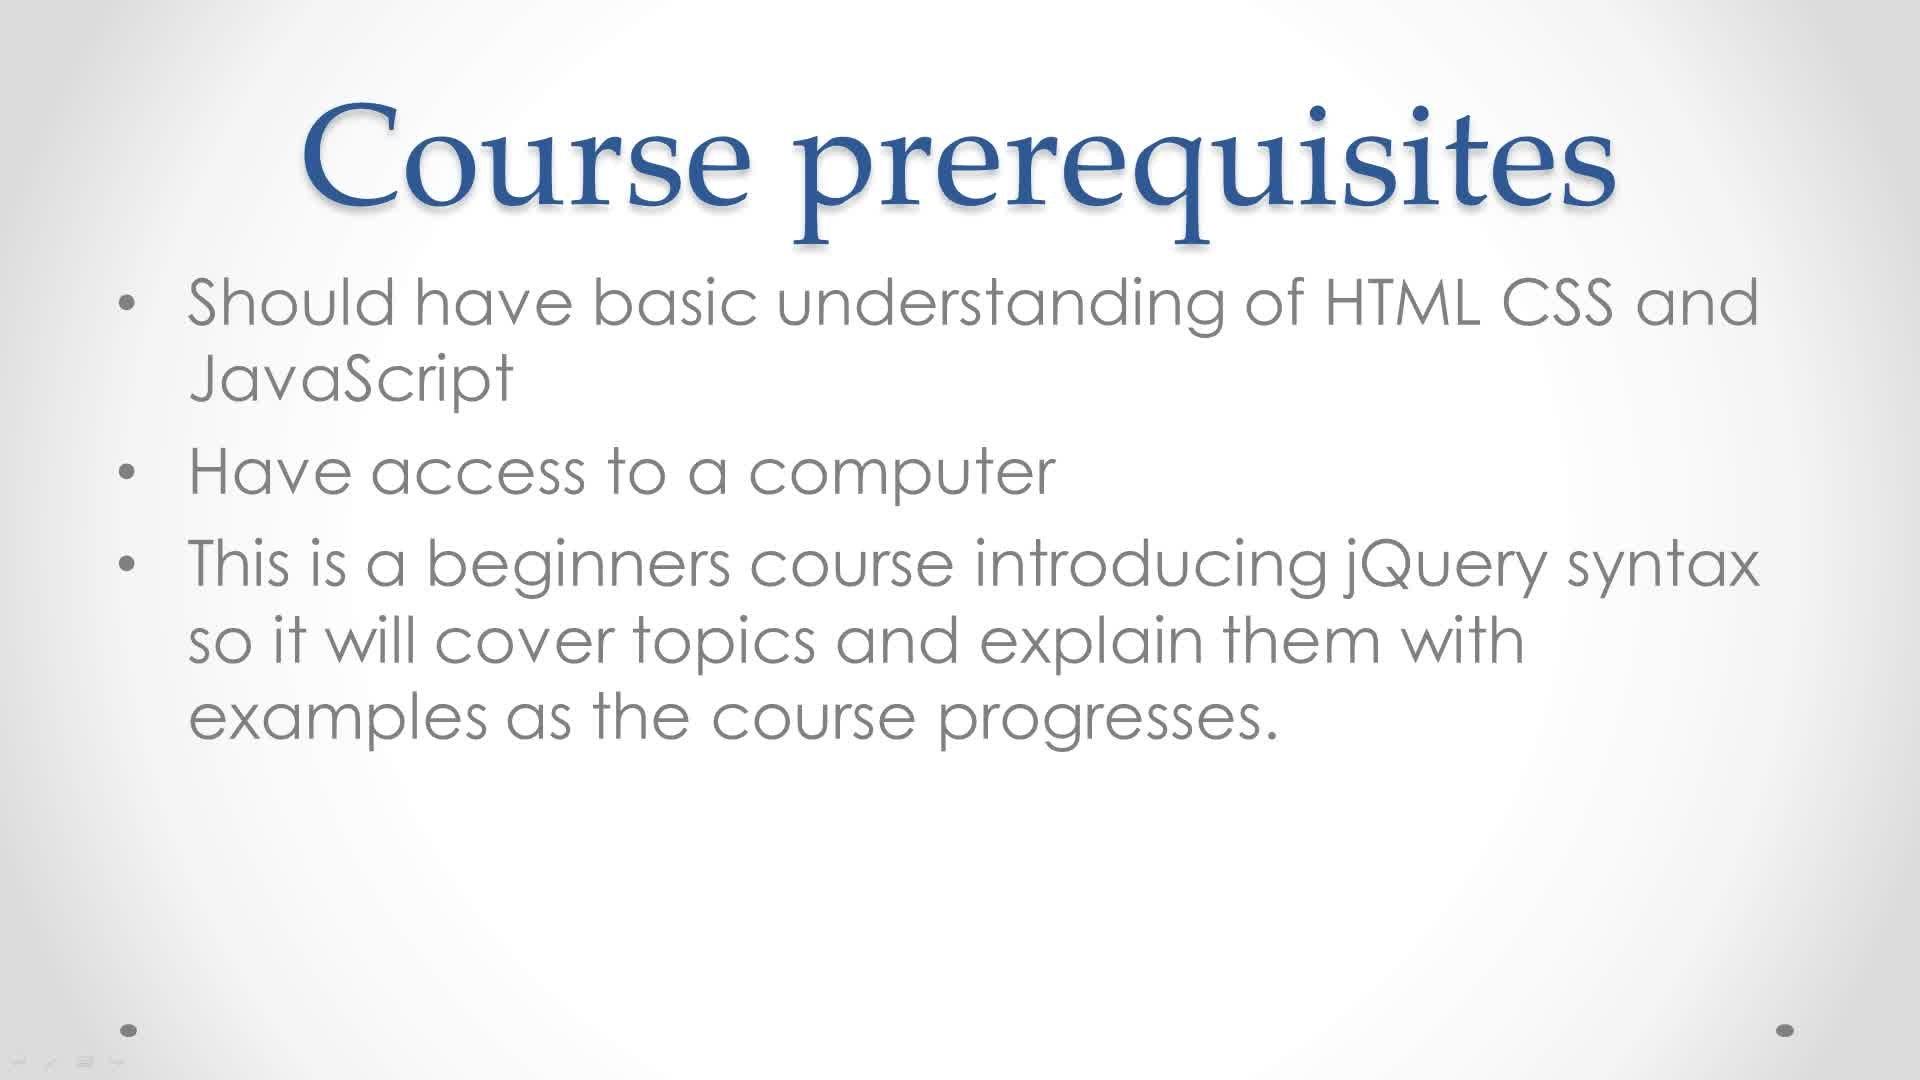 Codepen to practice Front end web development skills - Skillshare